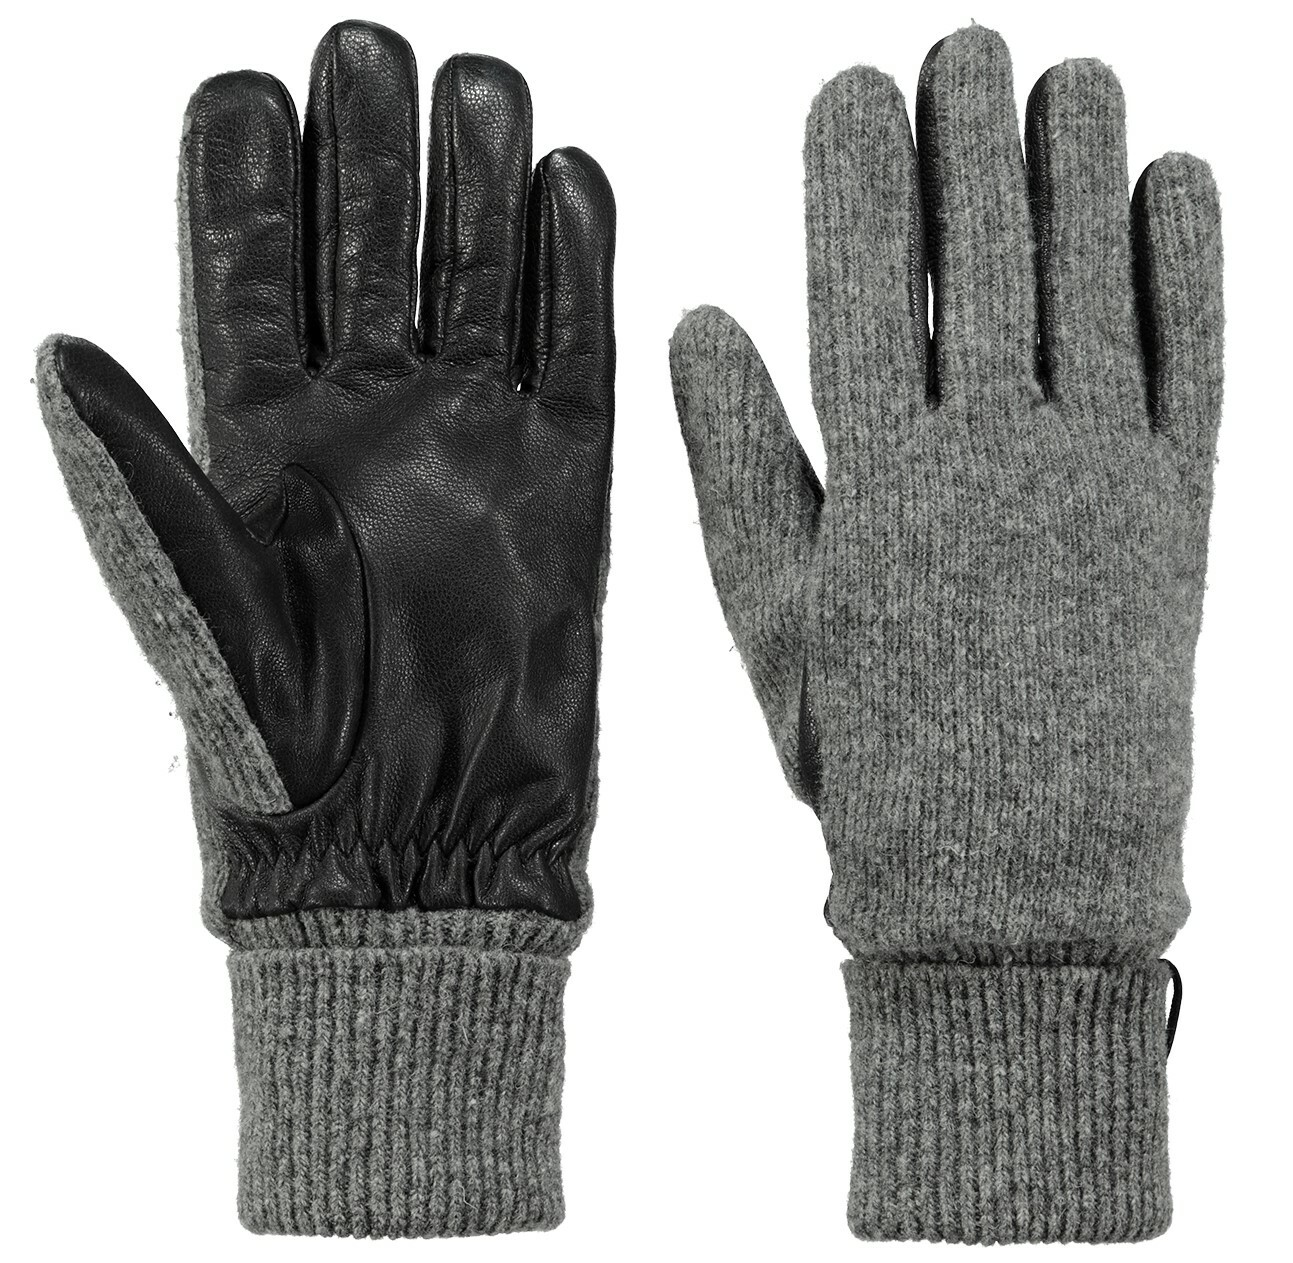 Barts Bhric Gloves